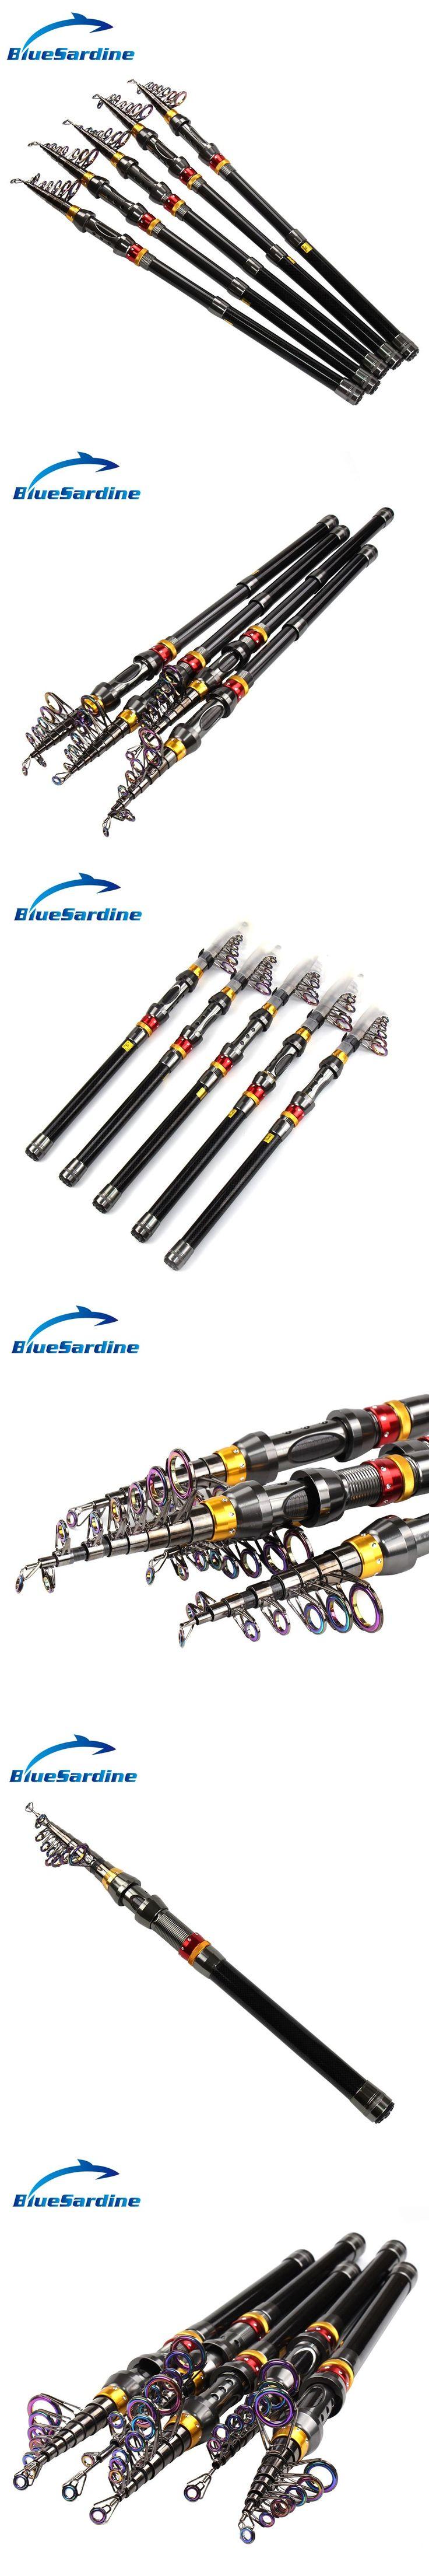 BlueSardine Telescopic Fishing Rod Carbon Fiber Spinning Rod Sea Fishing Pole Pesca Peche 1.8M - 3.6M #fishingrod